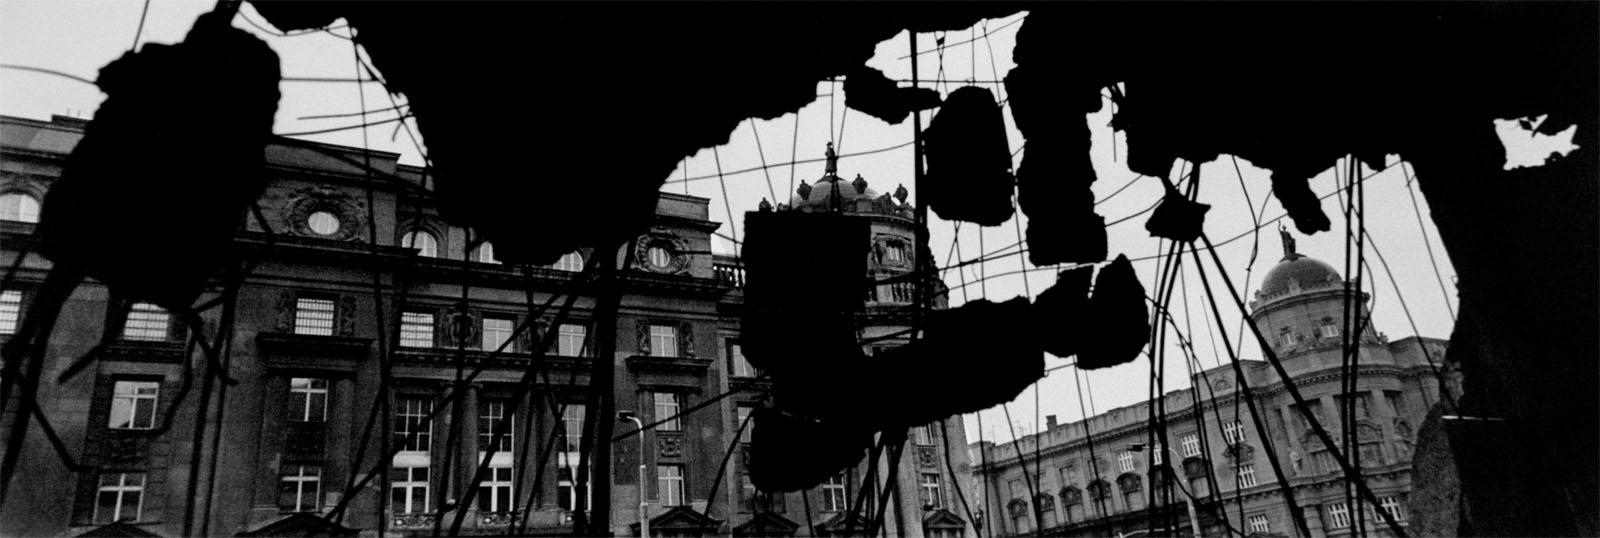 Art and Documentary Photography - Loading BGD___Fabio_Sgroi_032.jpg